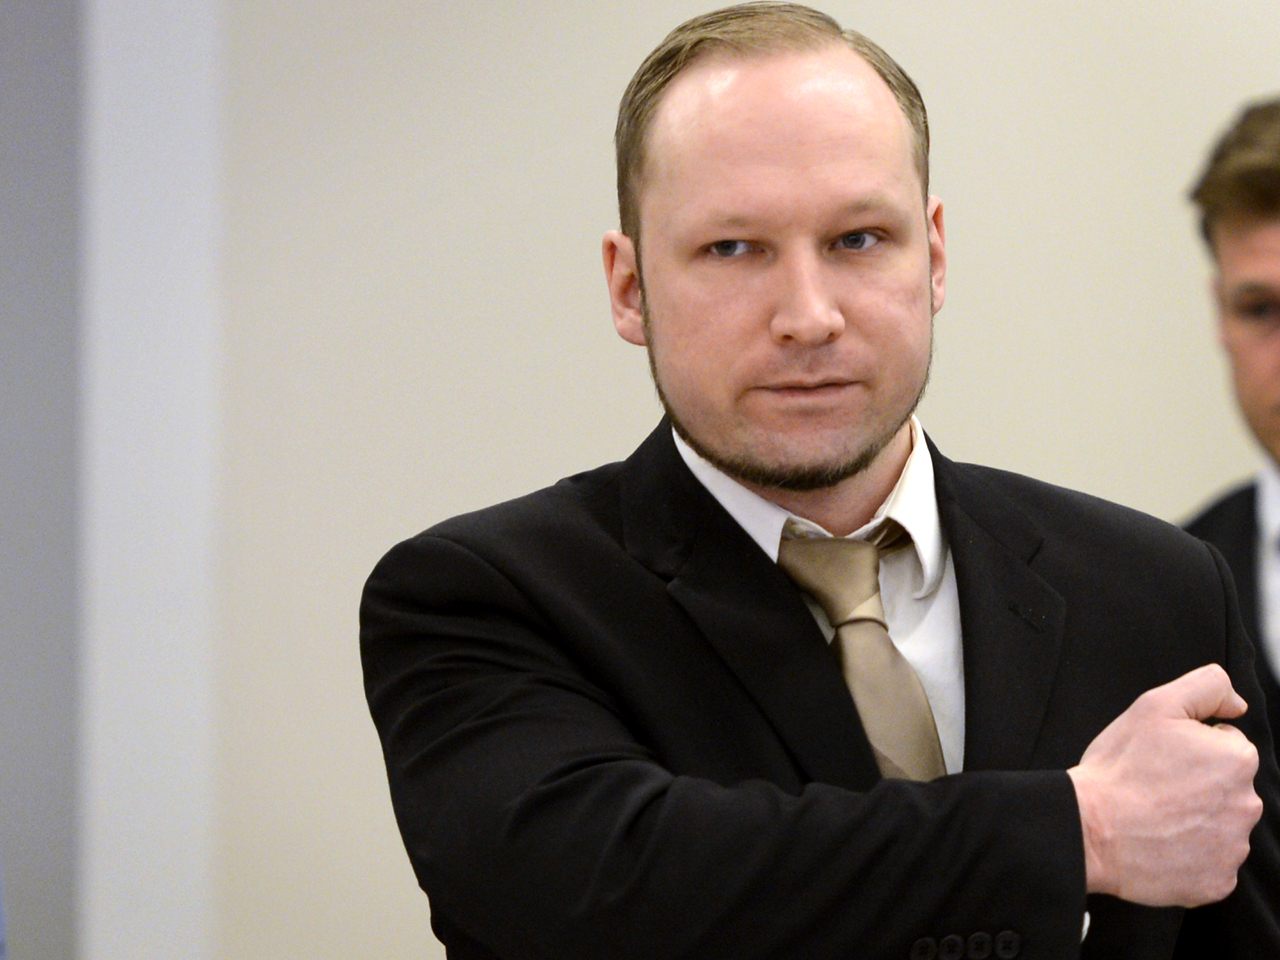 Breivik Photo: Norway Mass Killer Anders Behring Breivik Defends Massacre